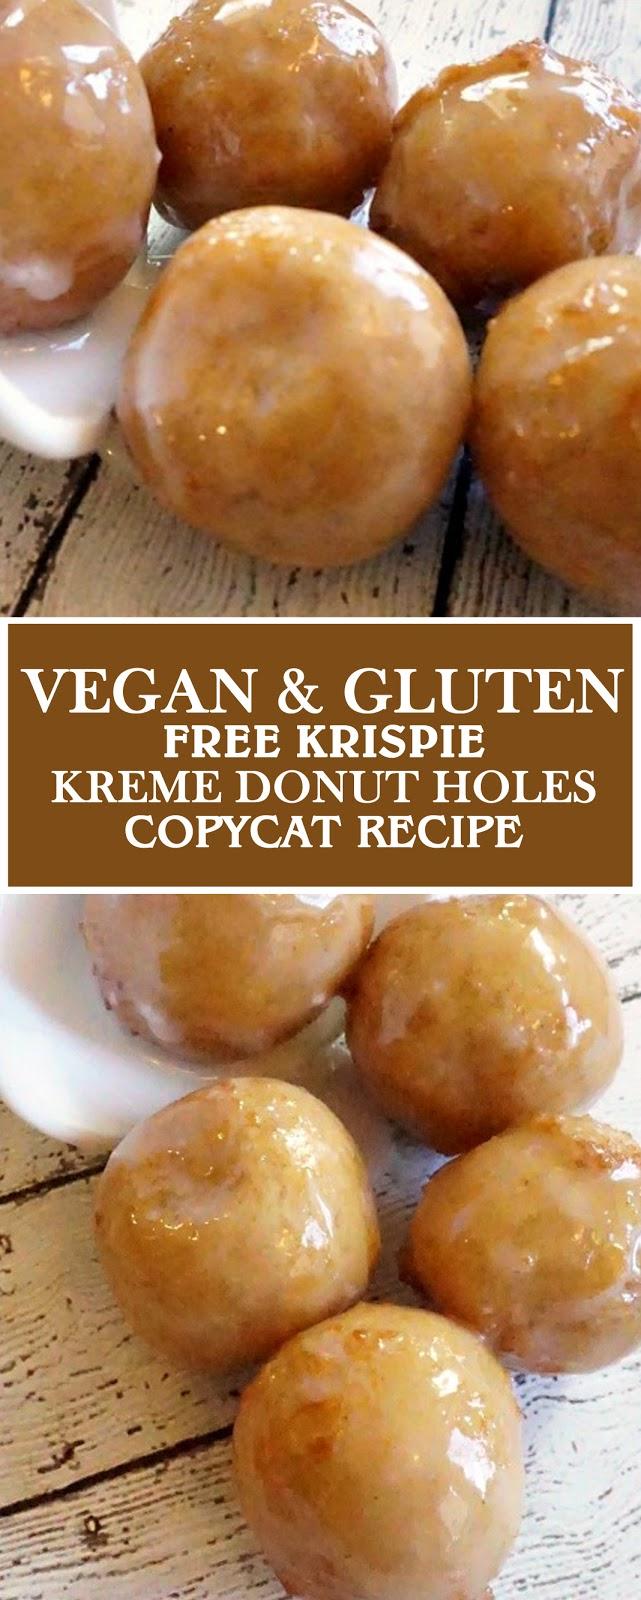 Vegan & Gluten-Free Krispie Kreme Donut Holes Copycat Recipe